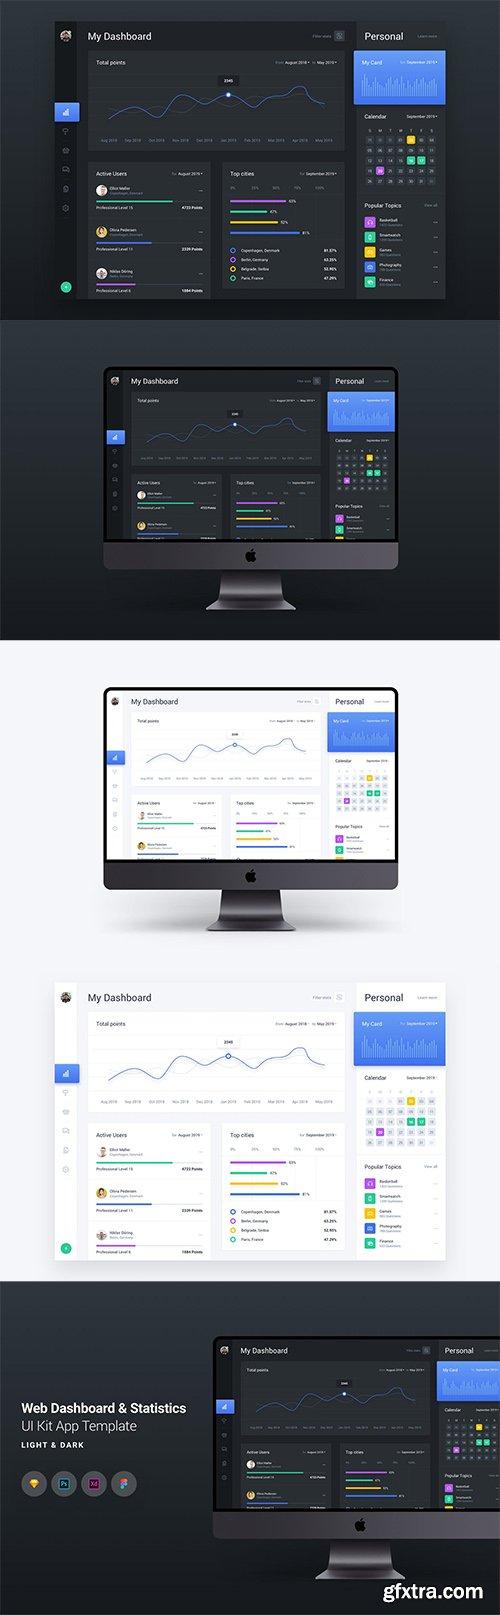 Web Dashboard & Statistics UI Kit App Template 1